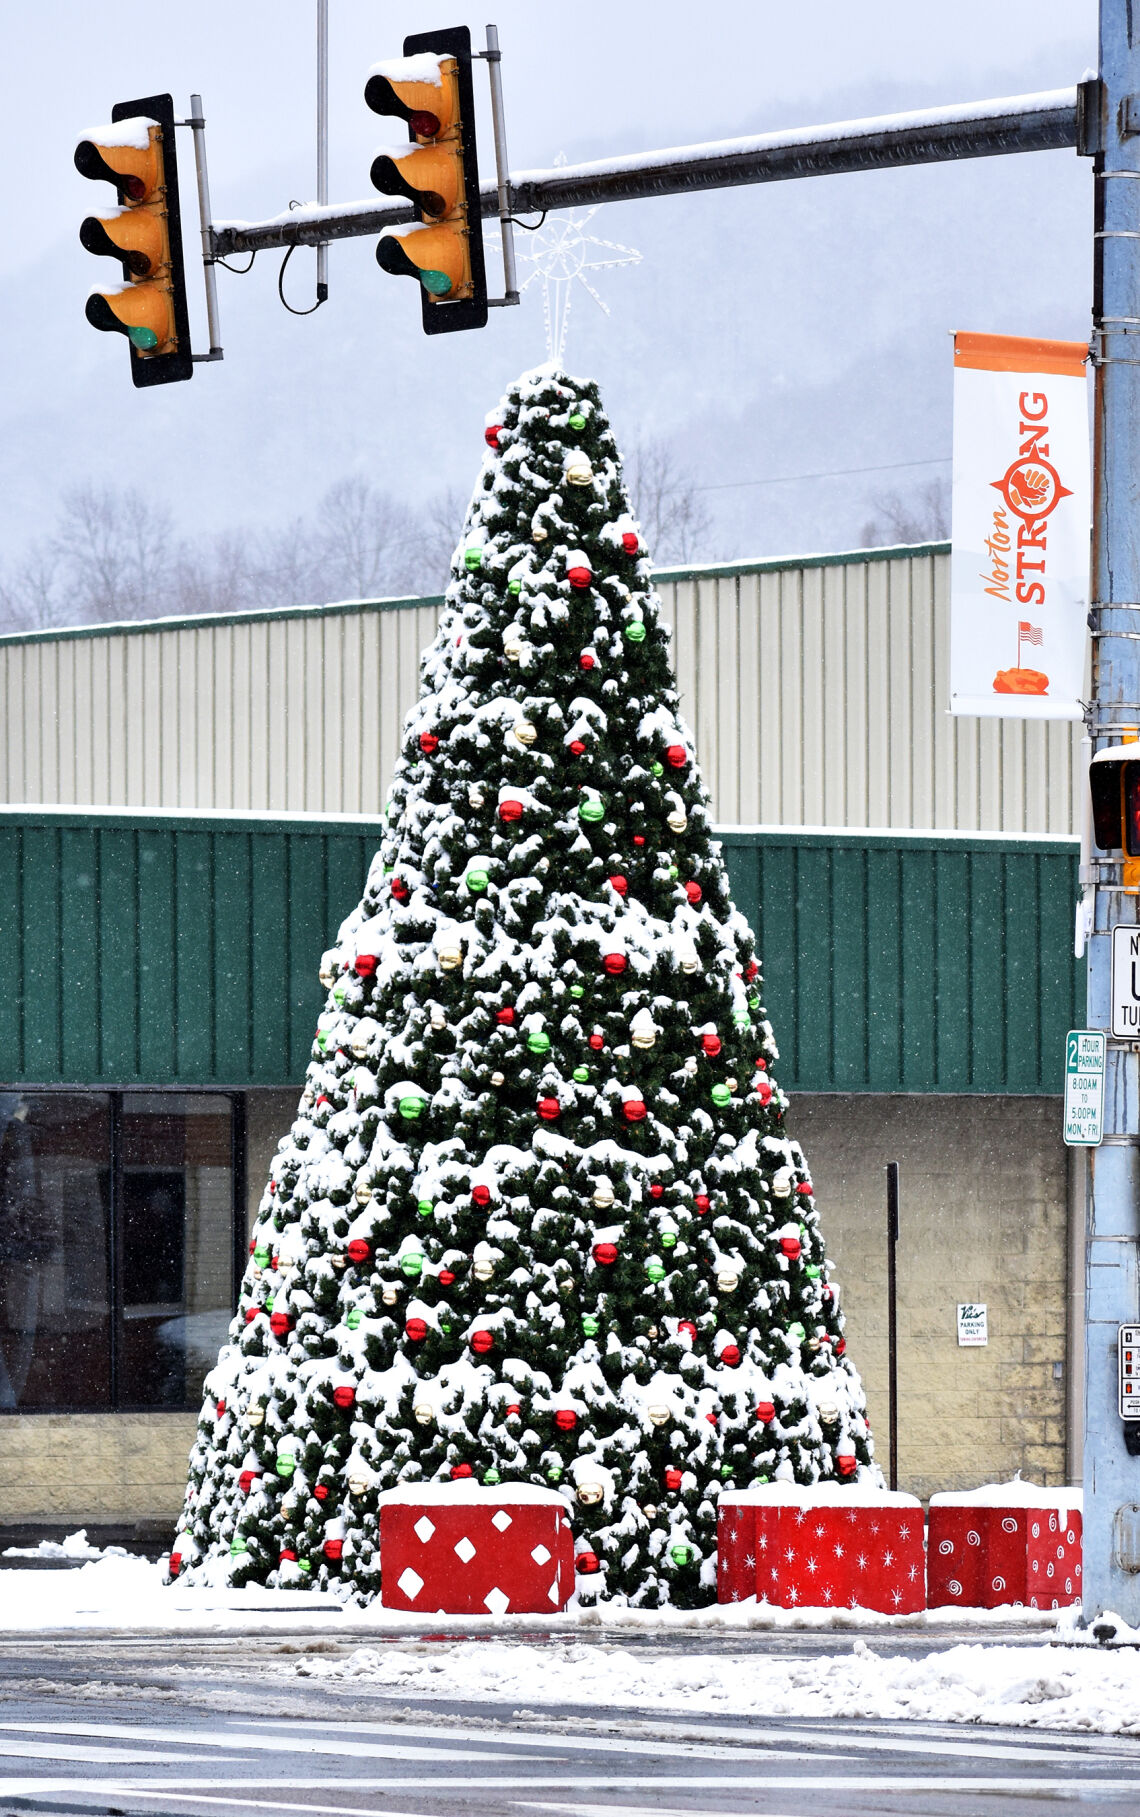 Snow day, Jan. 8, 2021 - Oh Christmas tree ...